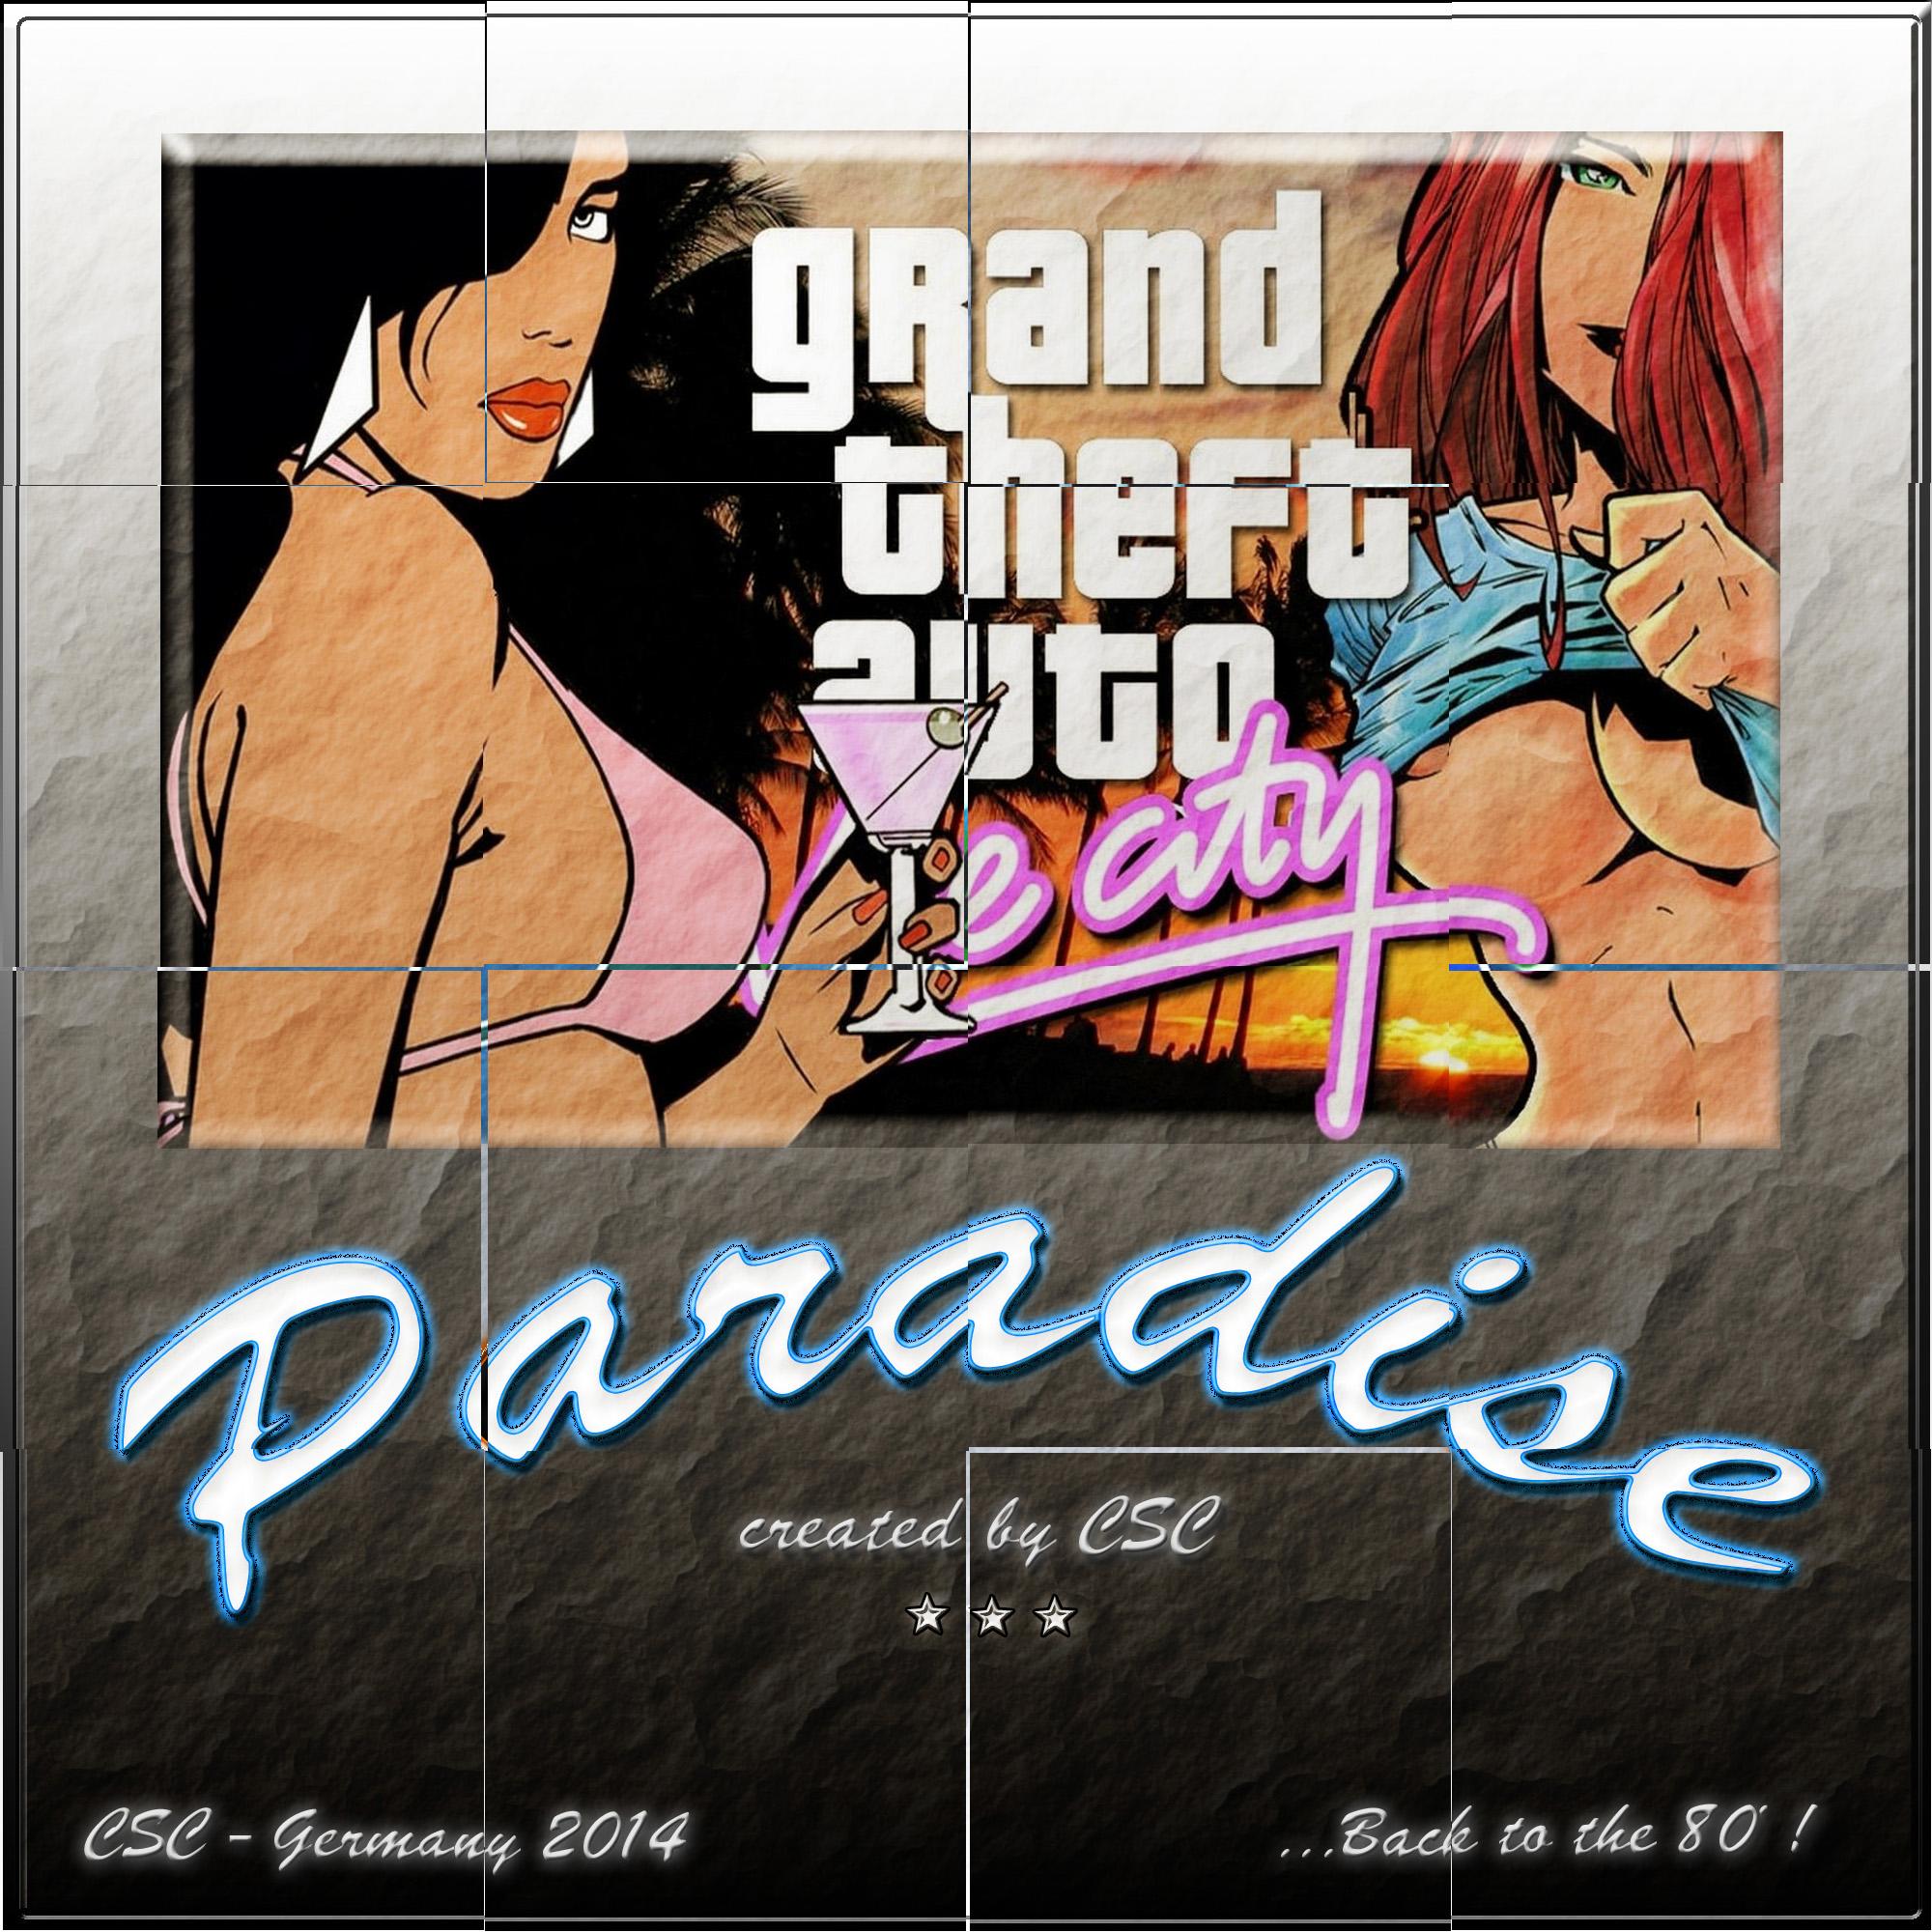 gta vice city audio rar file download